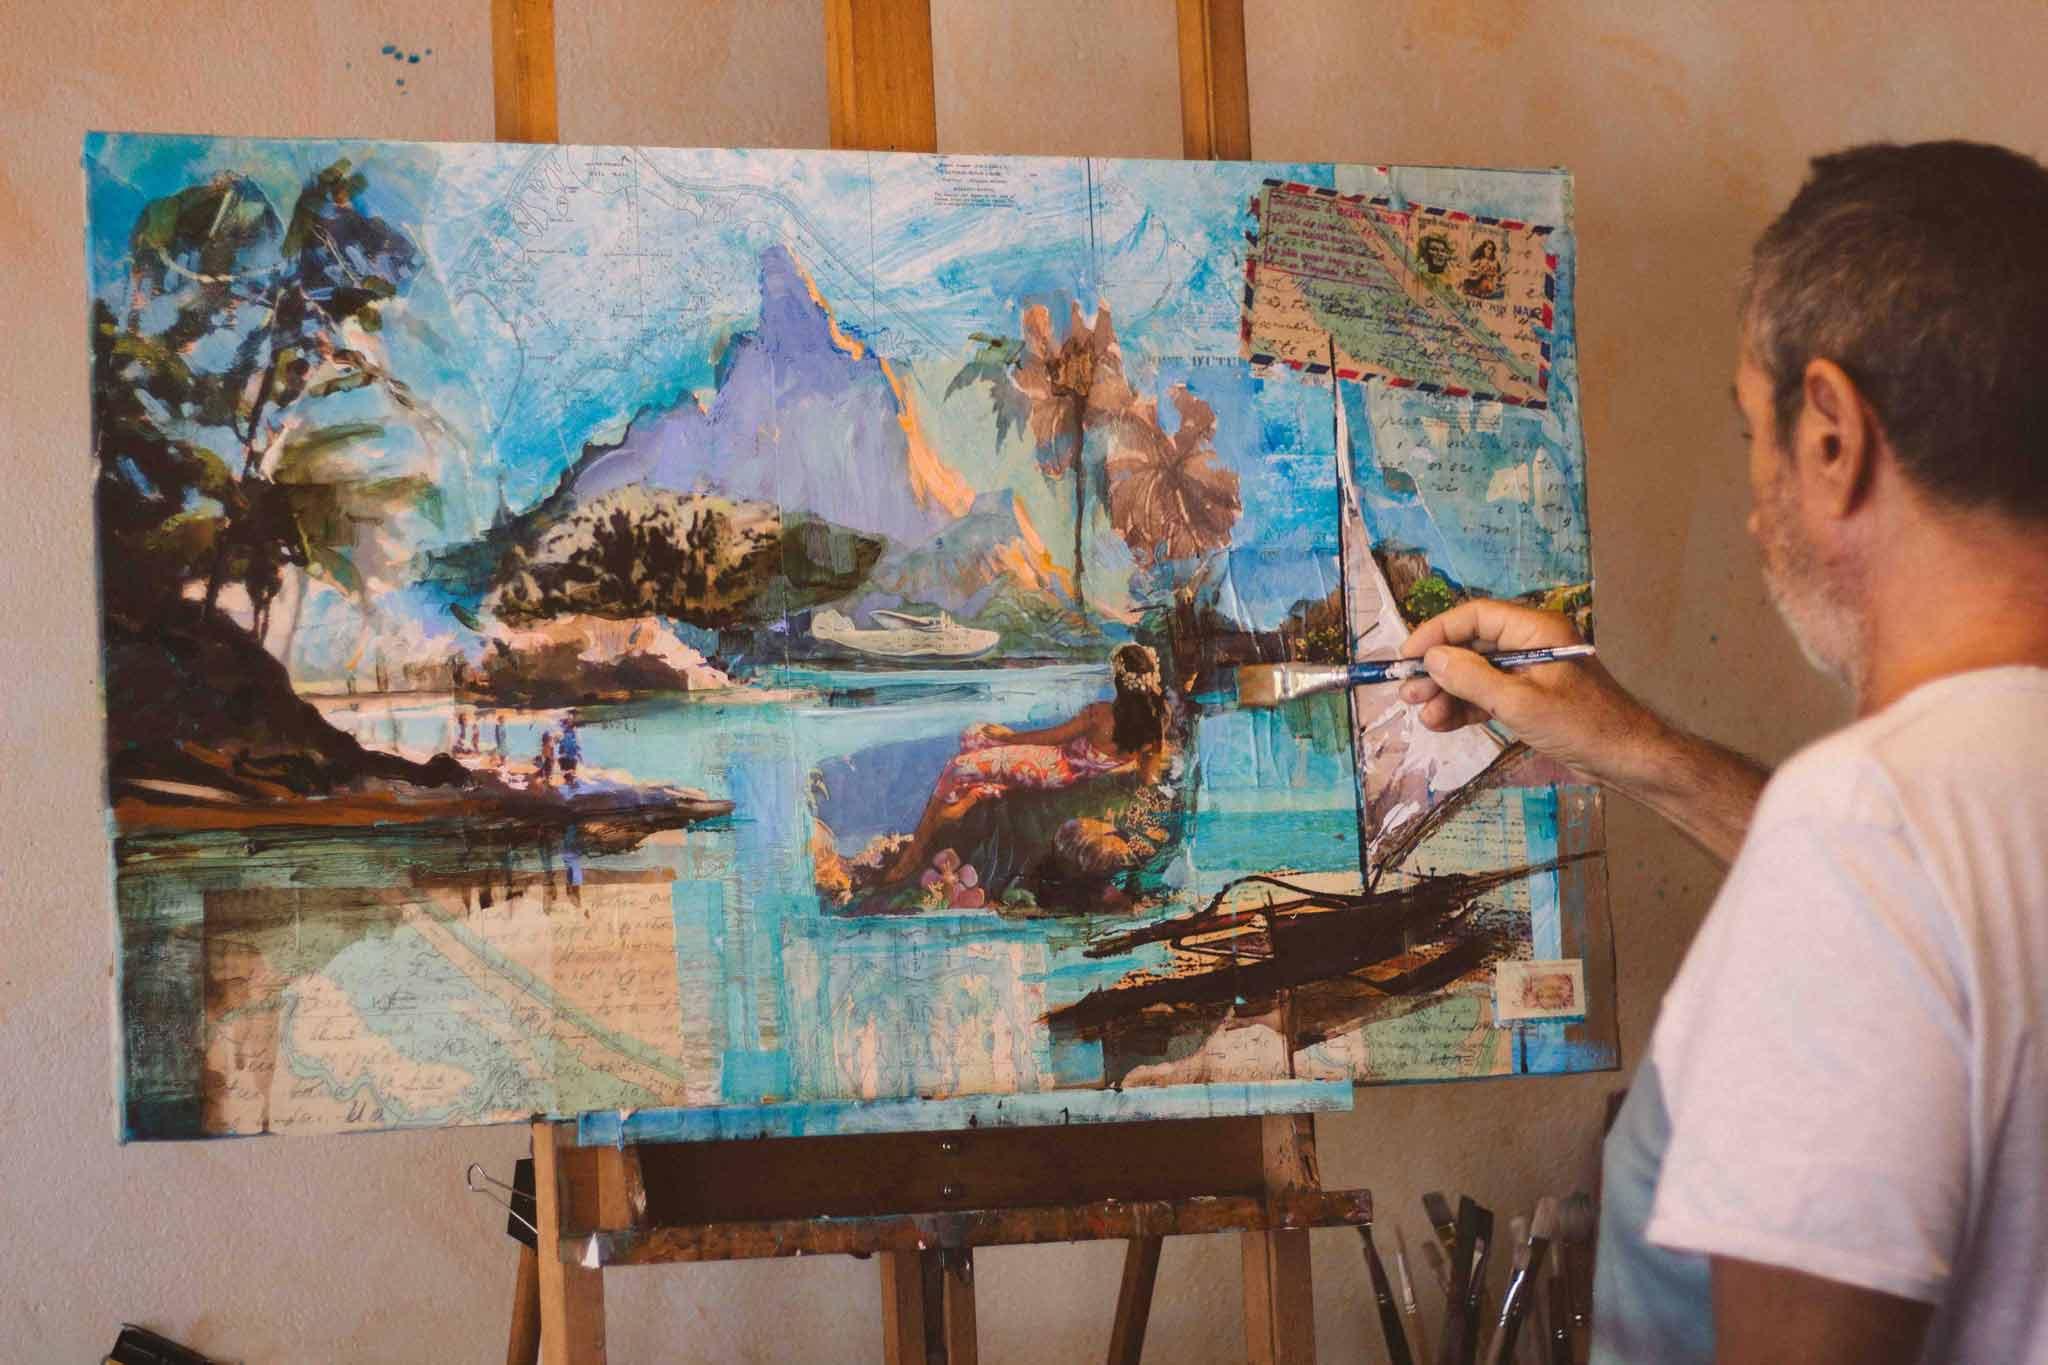 art artiste peintre bora bora polynésie française jean-pierre frey